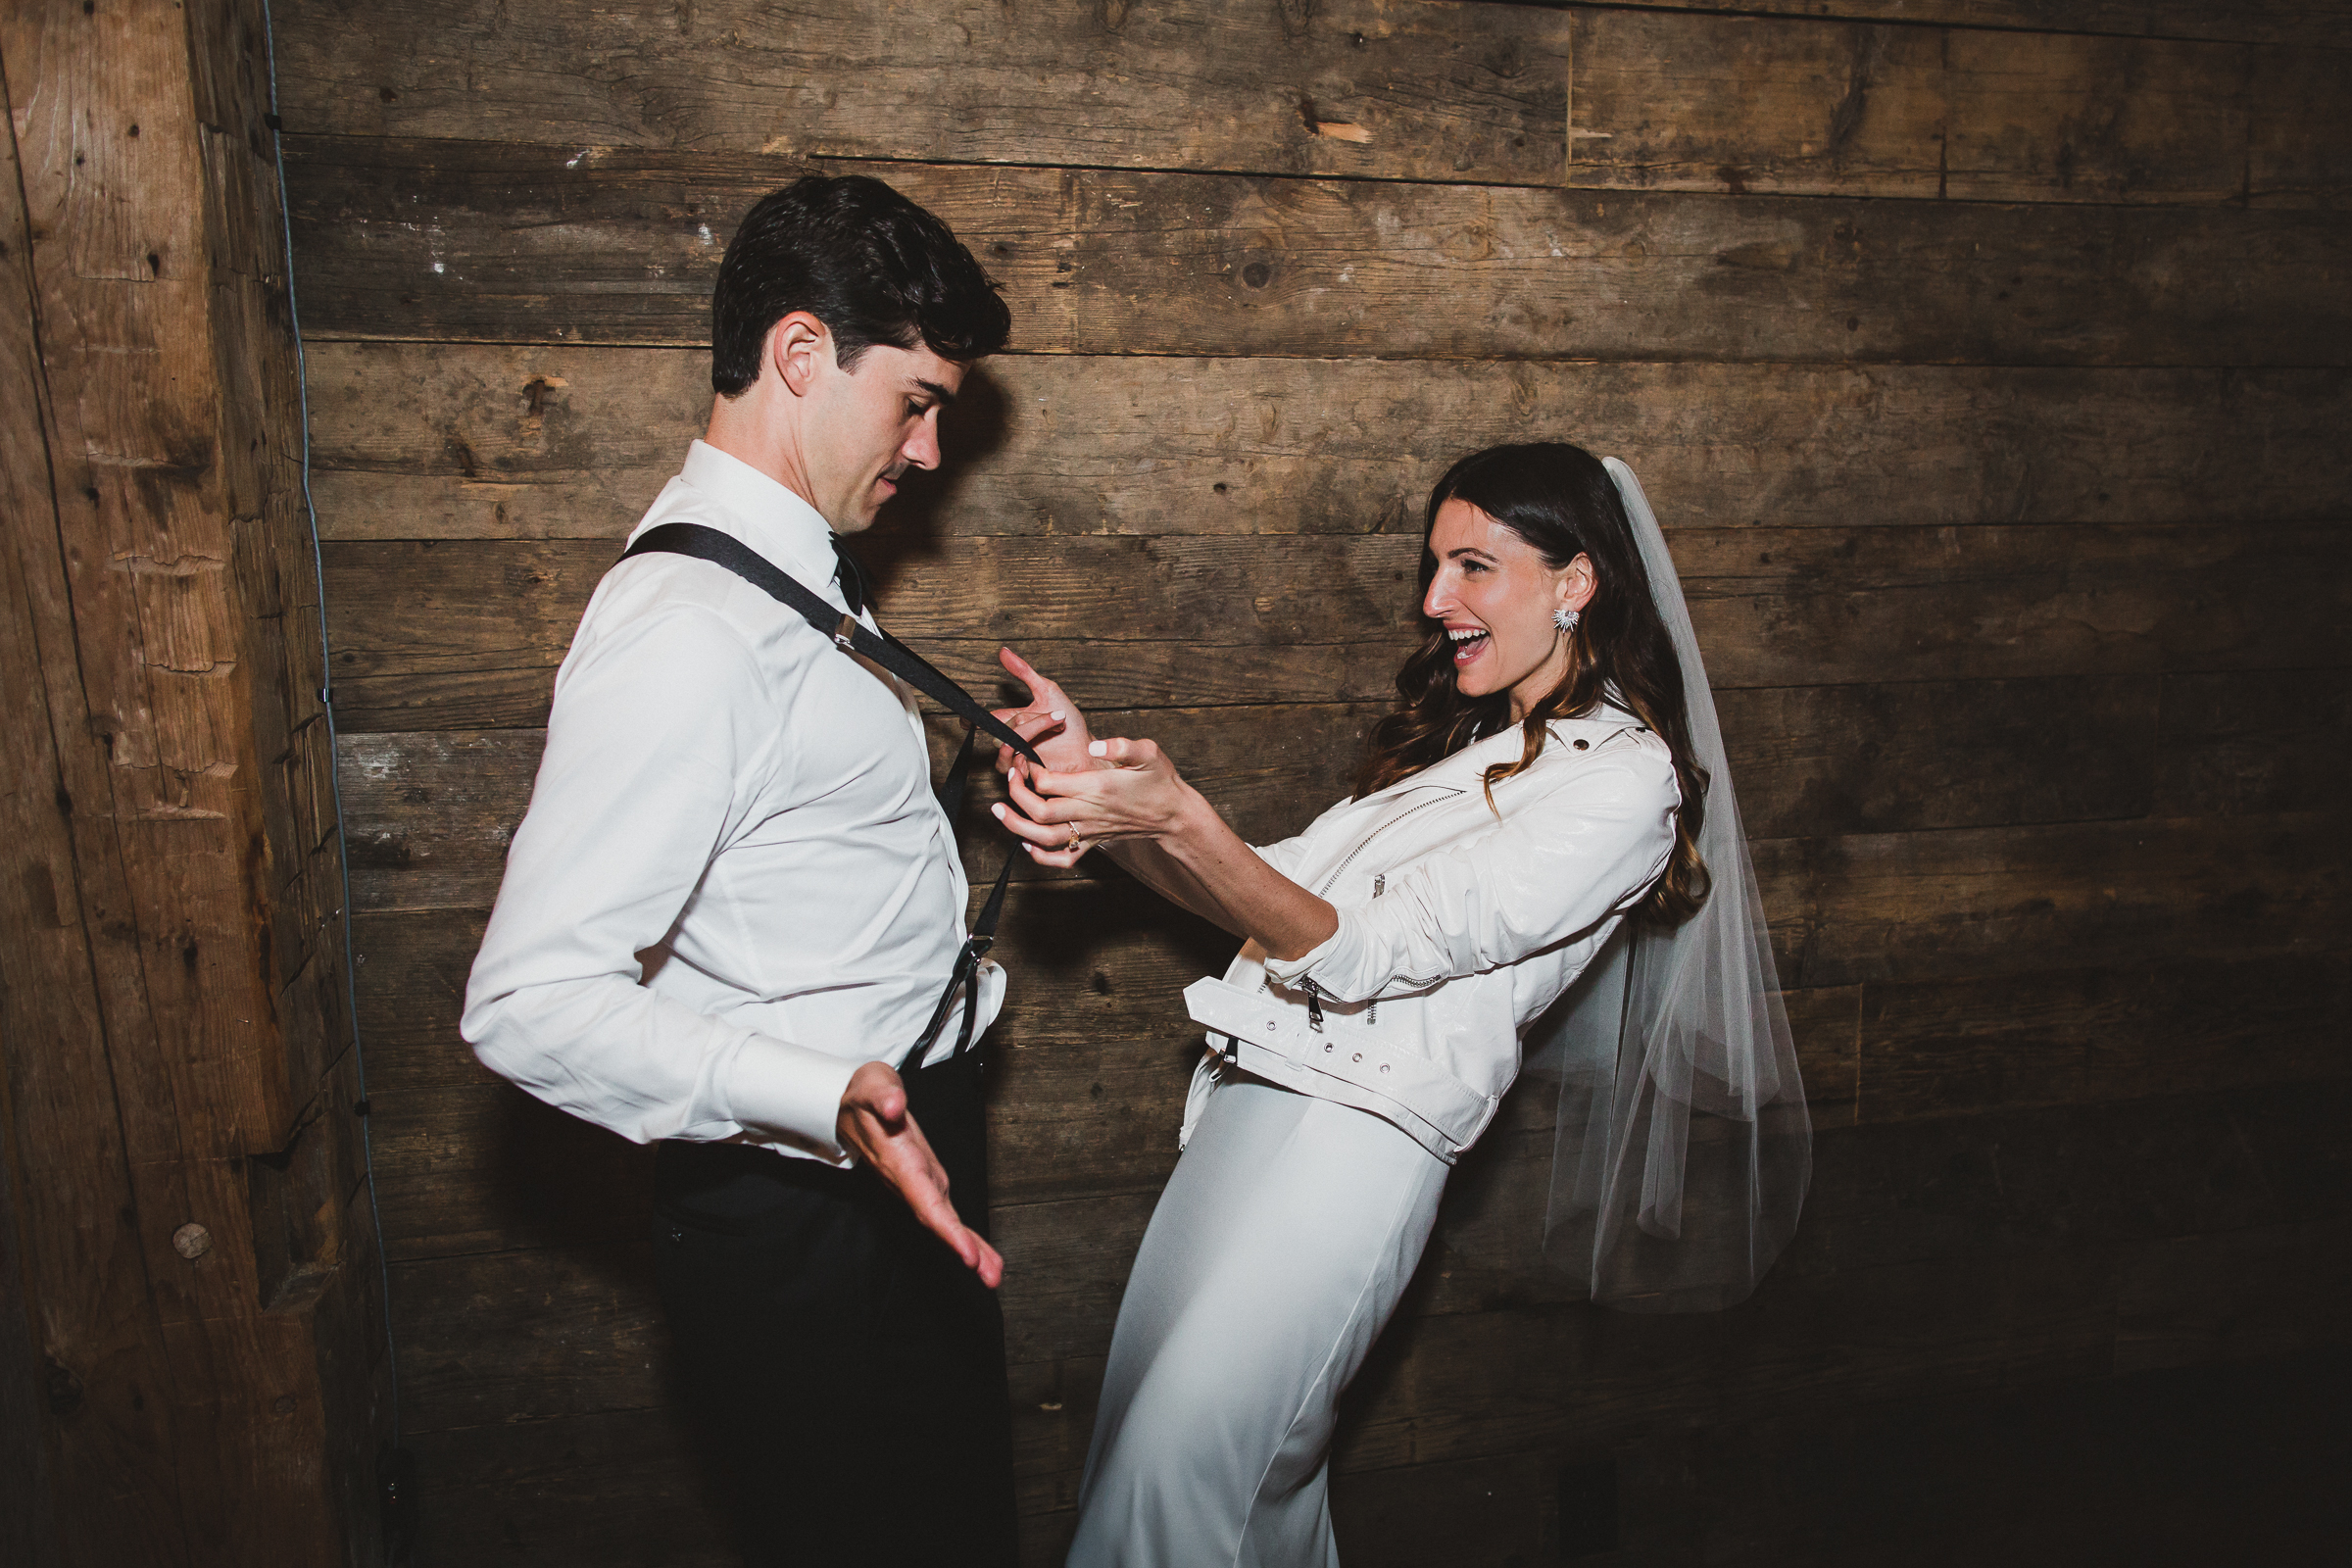 Handsome-Hollow-Long-Eddy-Catskills-New-York-Fine-Art-Documentary-Wedding-Photographer-140.jpg